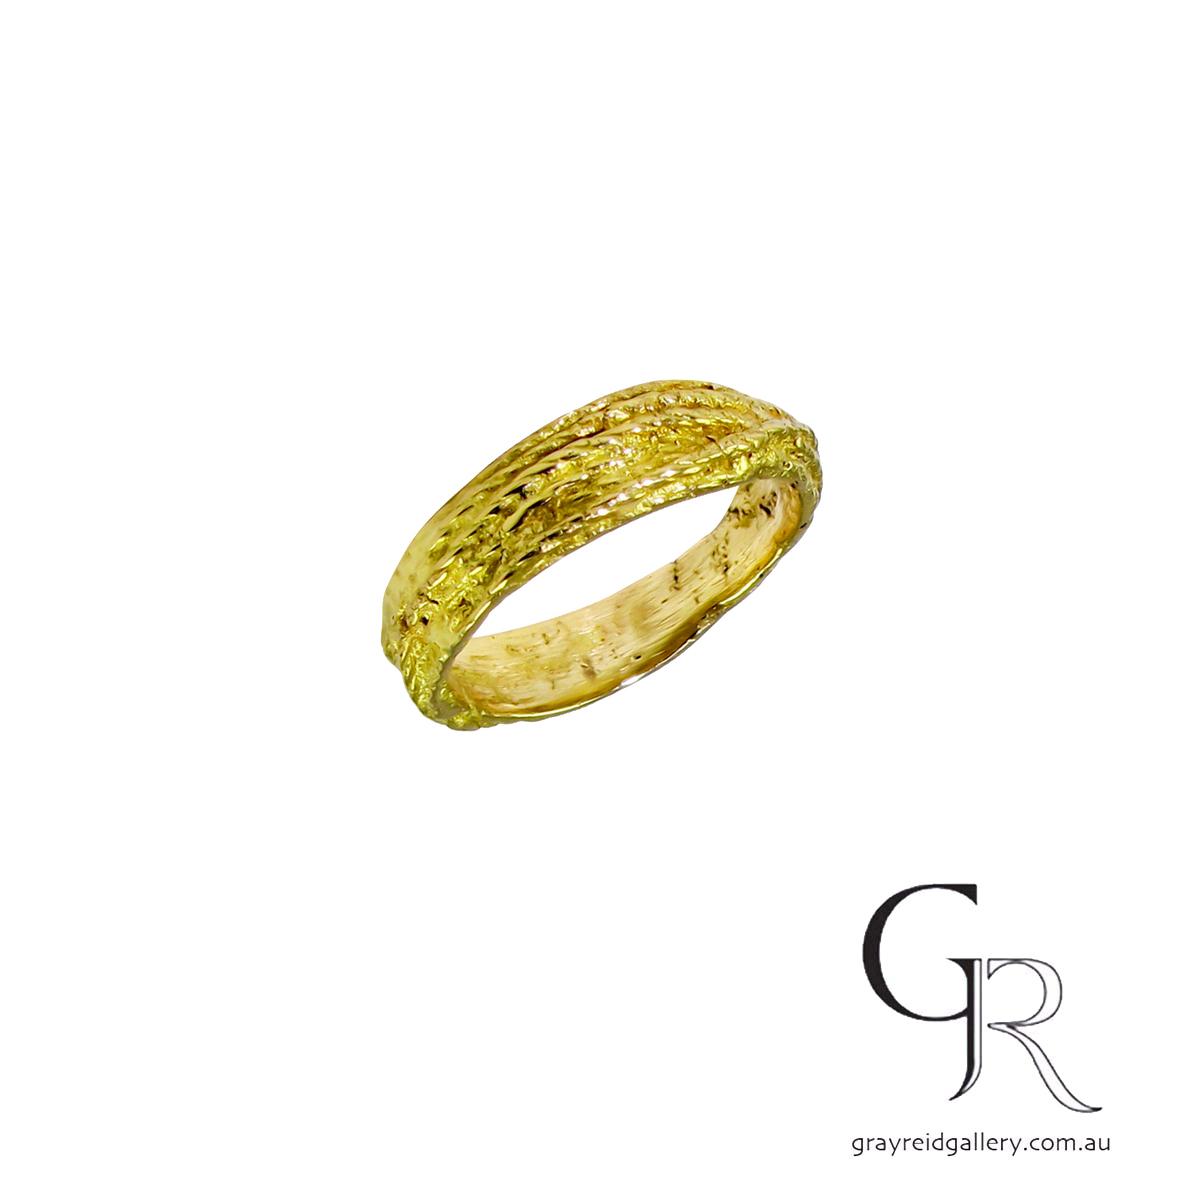 ali Alexander melbourne yellow gold wedding bands melbourne Gray Reid Gallery 5.jpg